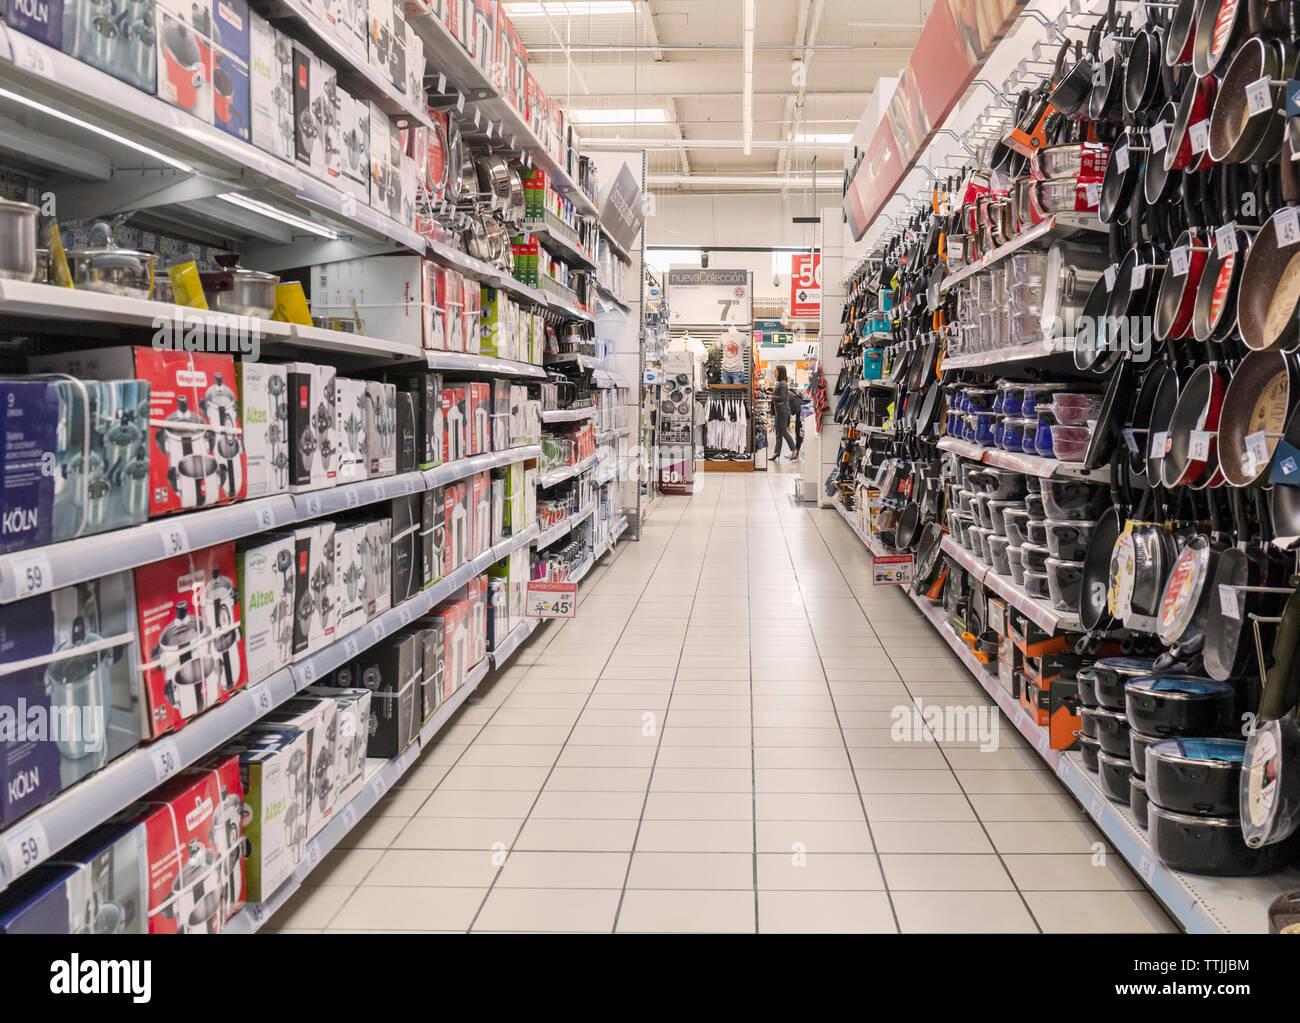 Utensils Shop Stock Photos & Utensils Shop Stock Images - Alamy